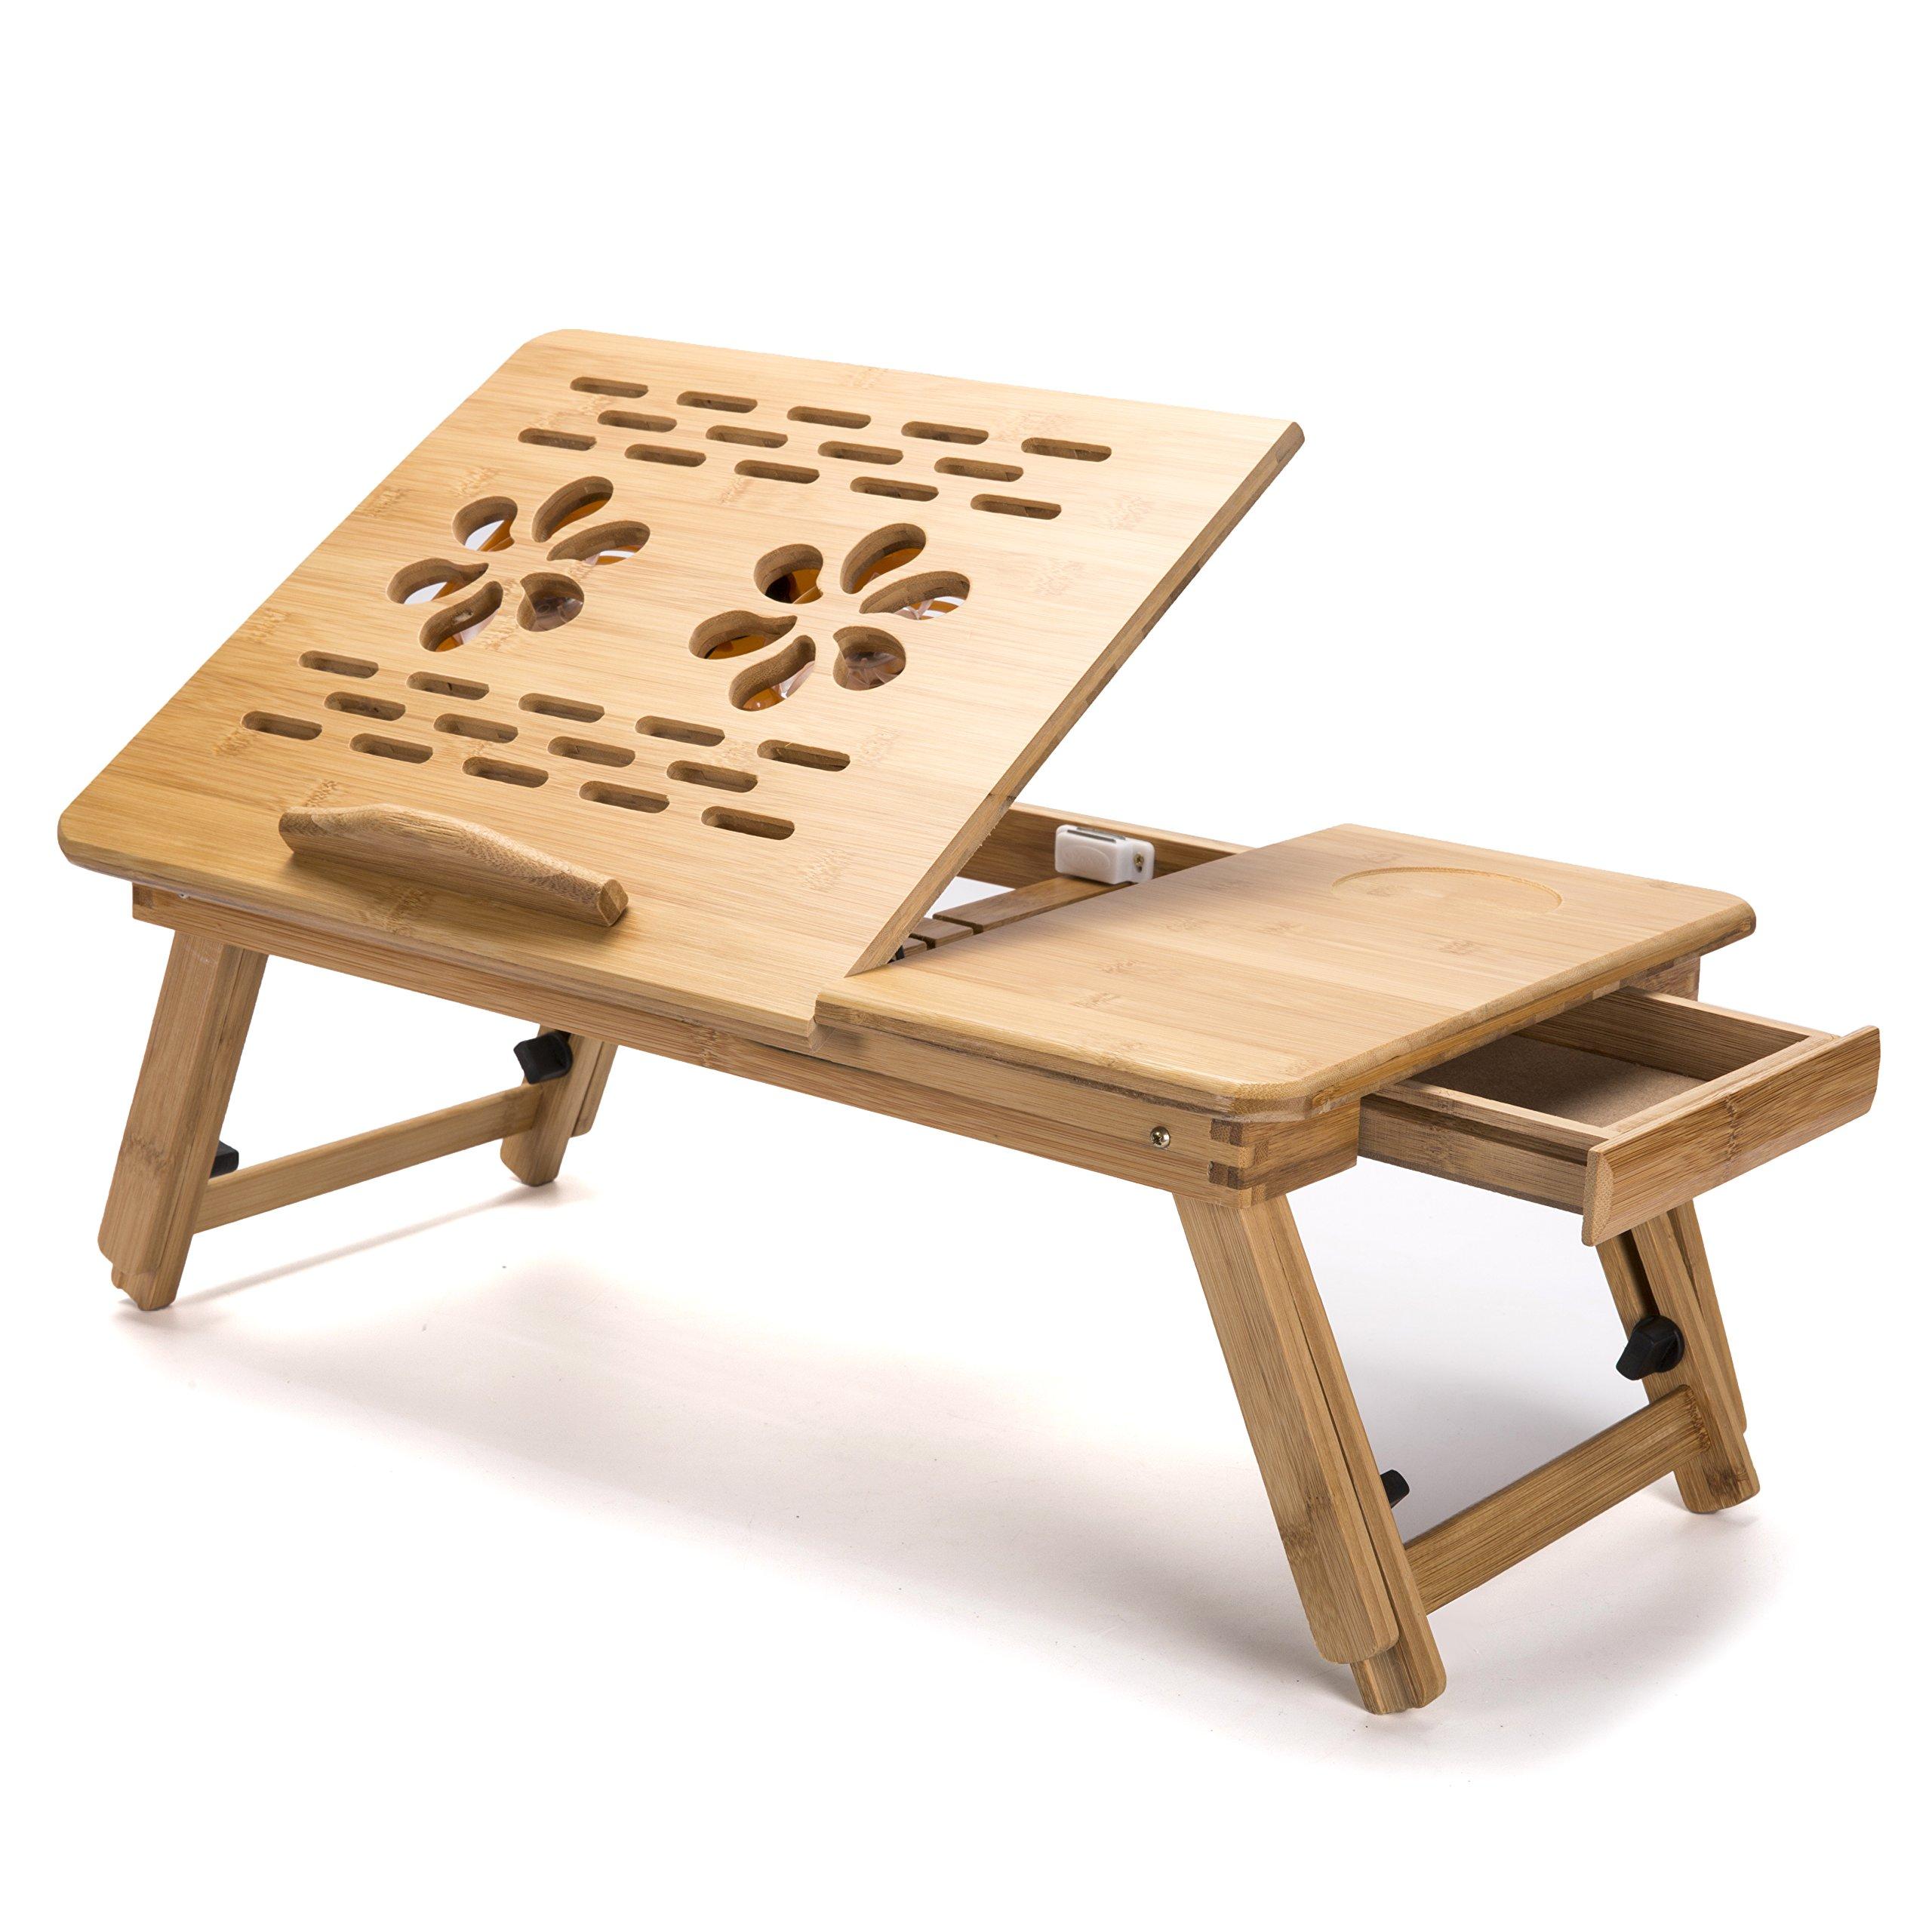 Laptop Desk Adjustable Legs Laptop Desk Table 100% Bamboo with USB Fan Foldable Breakfast Serving Bed Tray